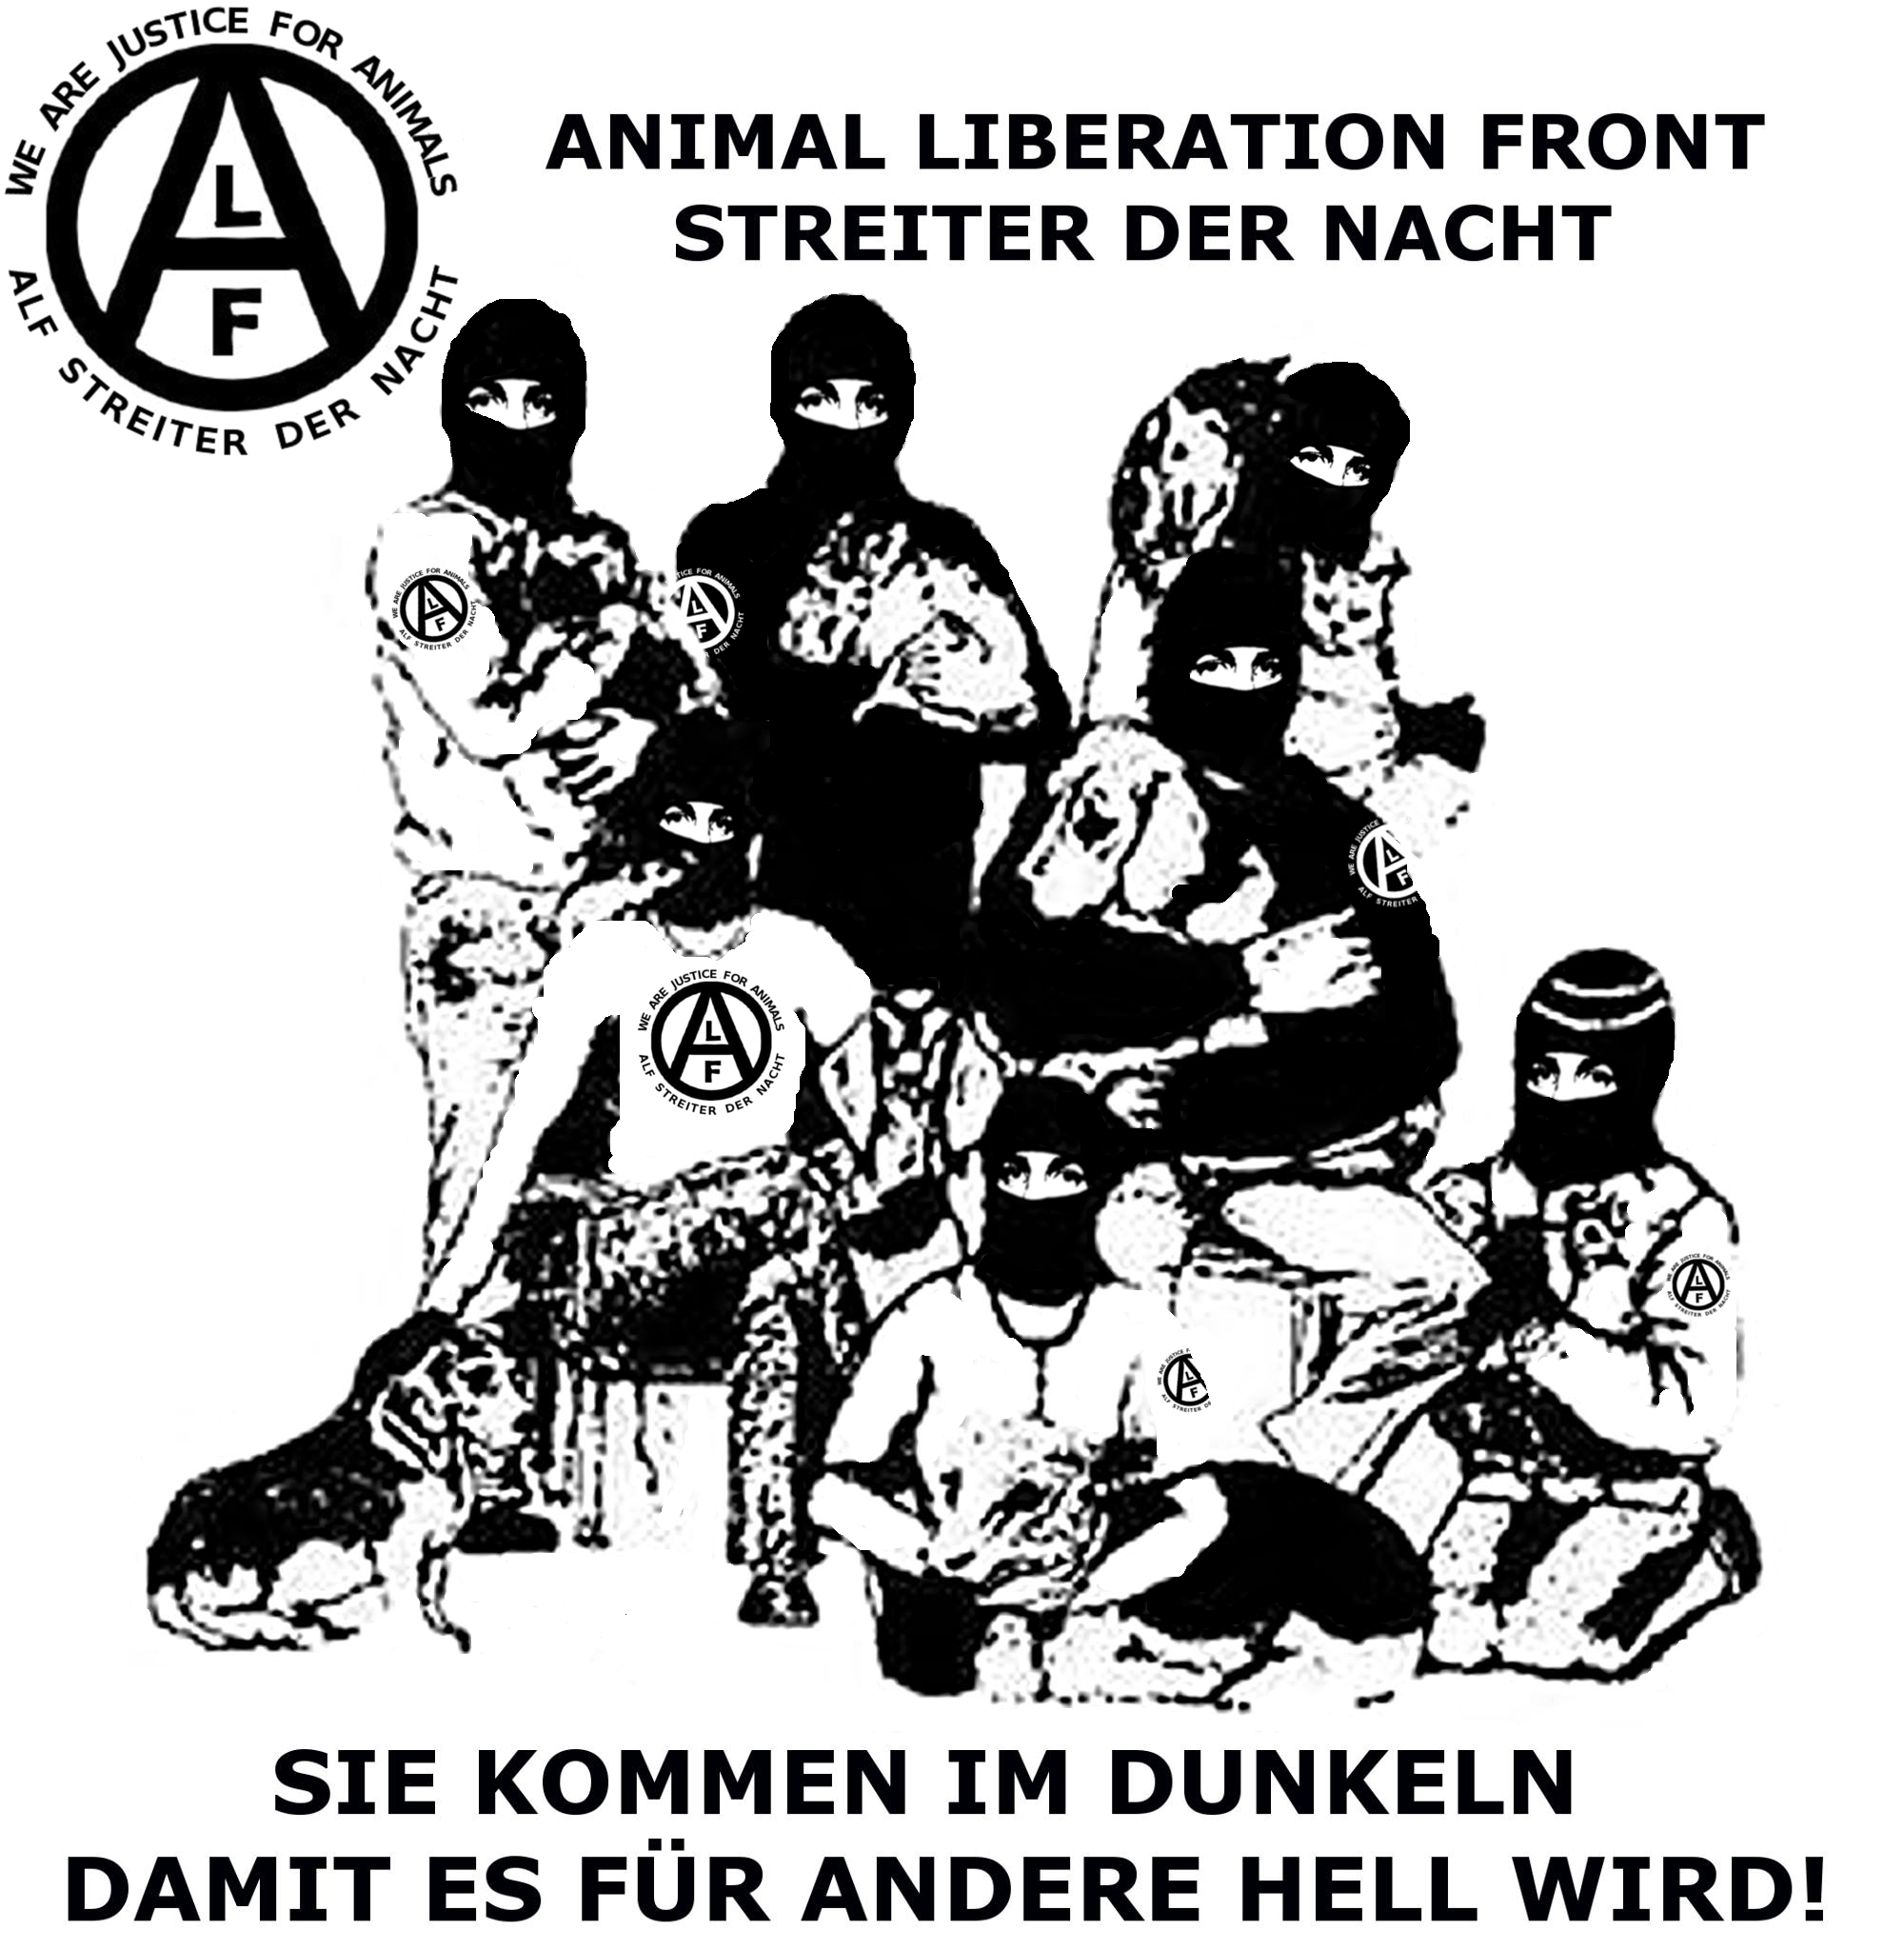 Animal liberation front alf streiter der nacht pinterest - Front de liberation des nains de jardins ...